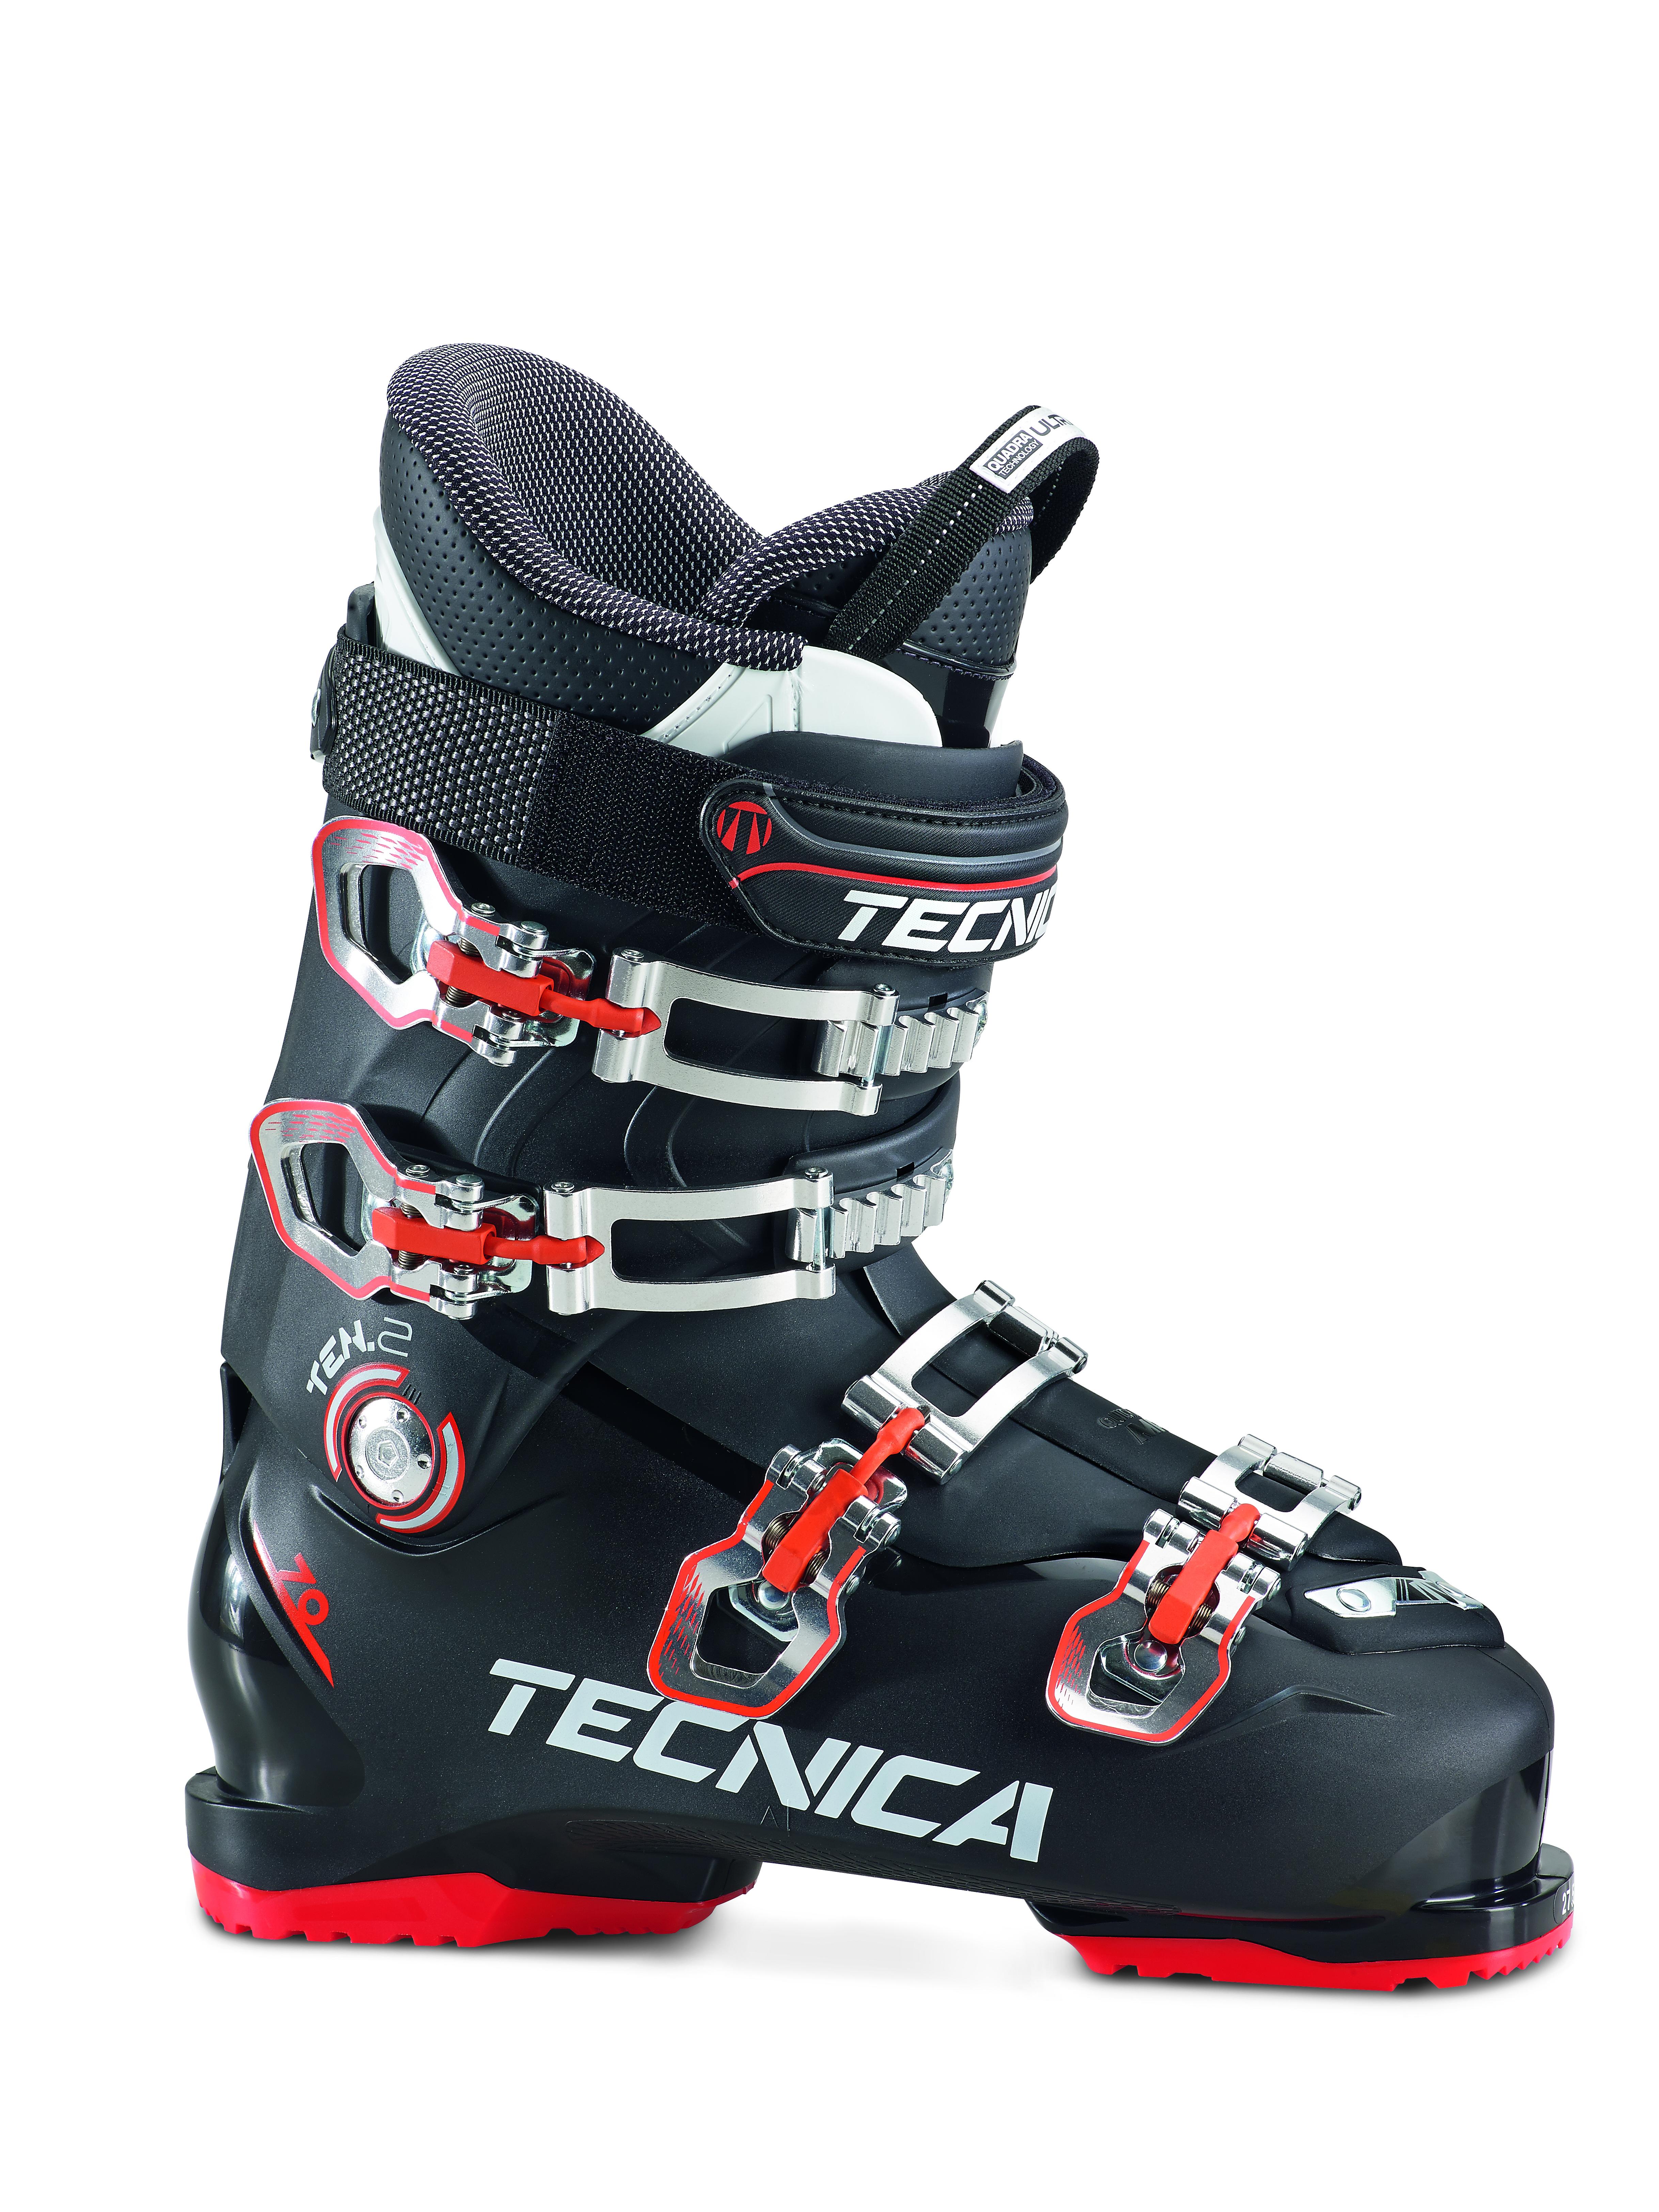 TECNICA TEN.2 70 HVL 295